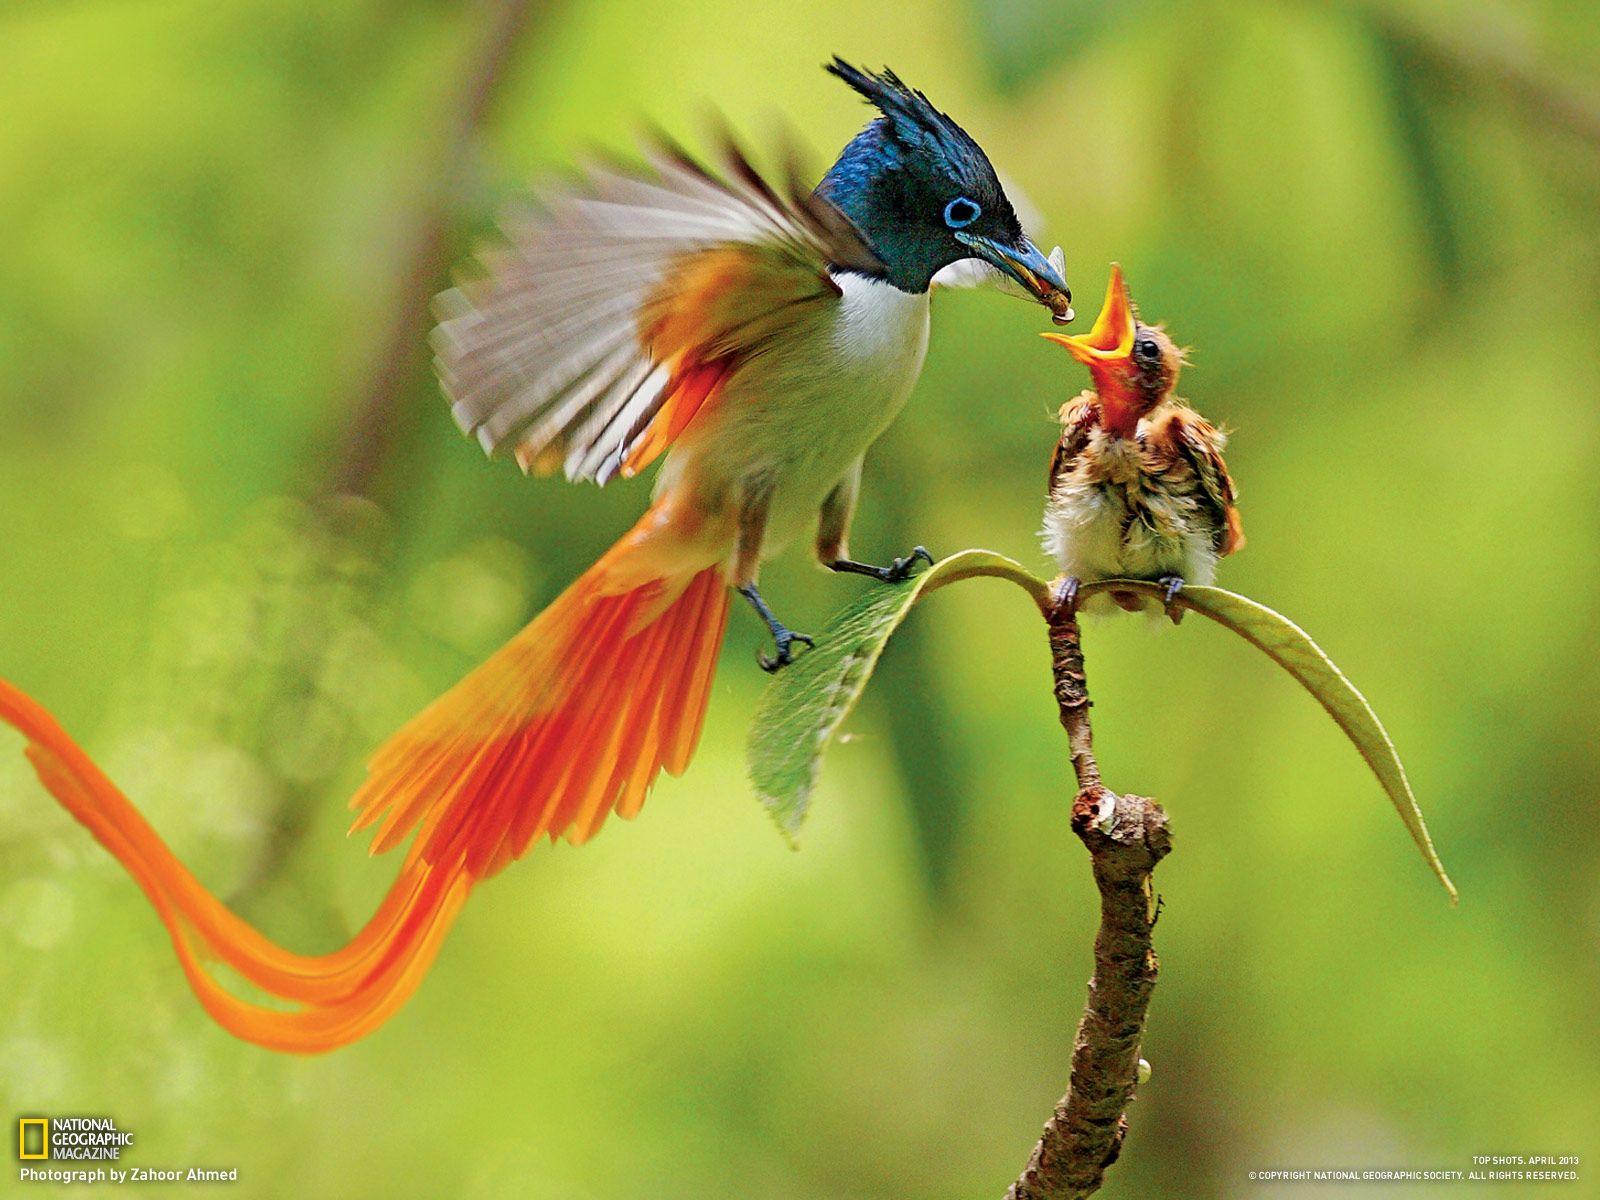 166pics] Four Seasons of Birds - Lovely Bird photography (Vol.3 ...